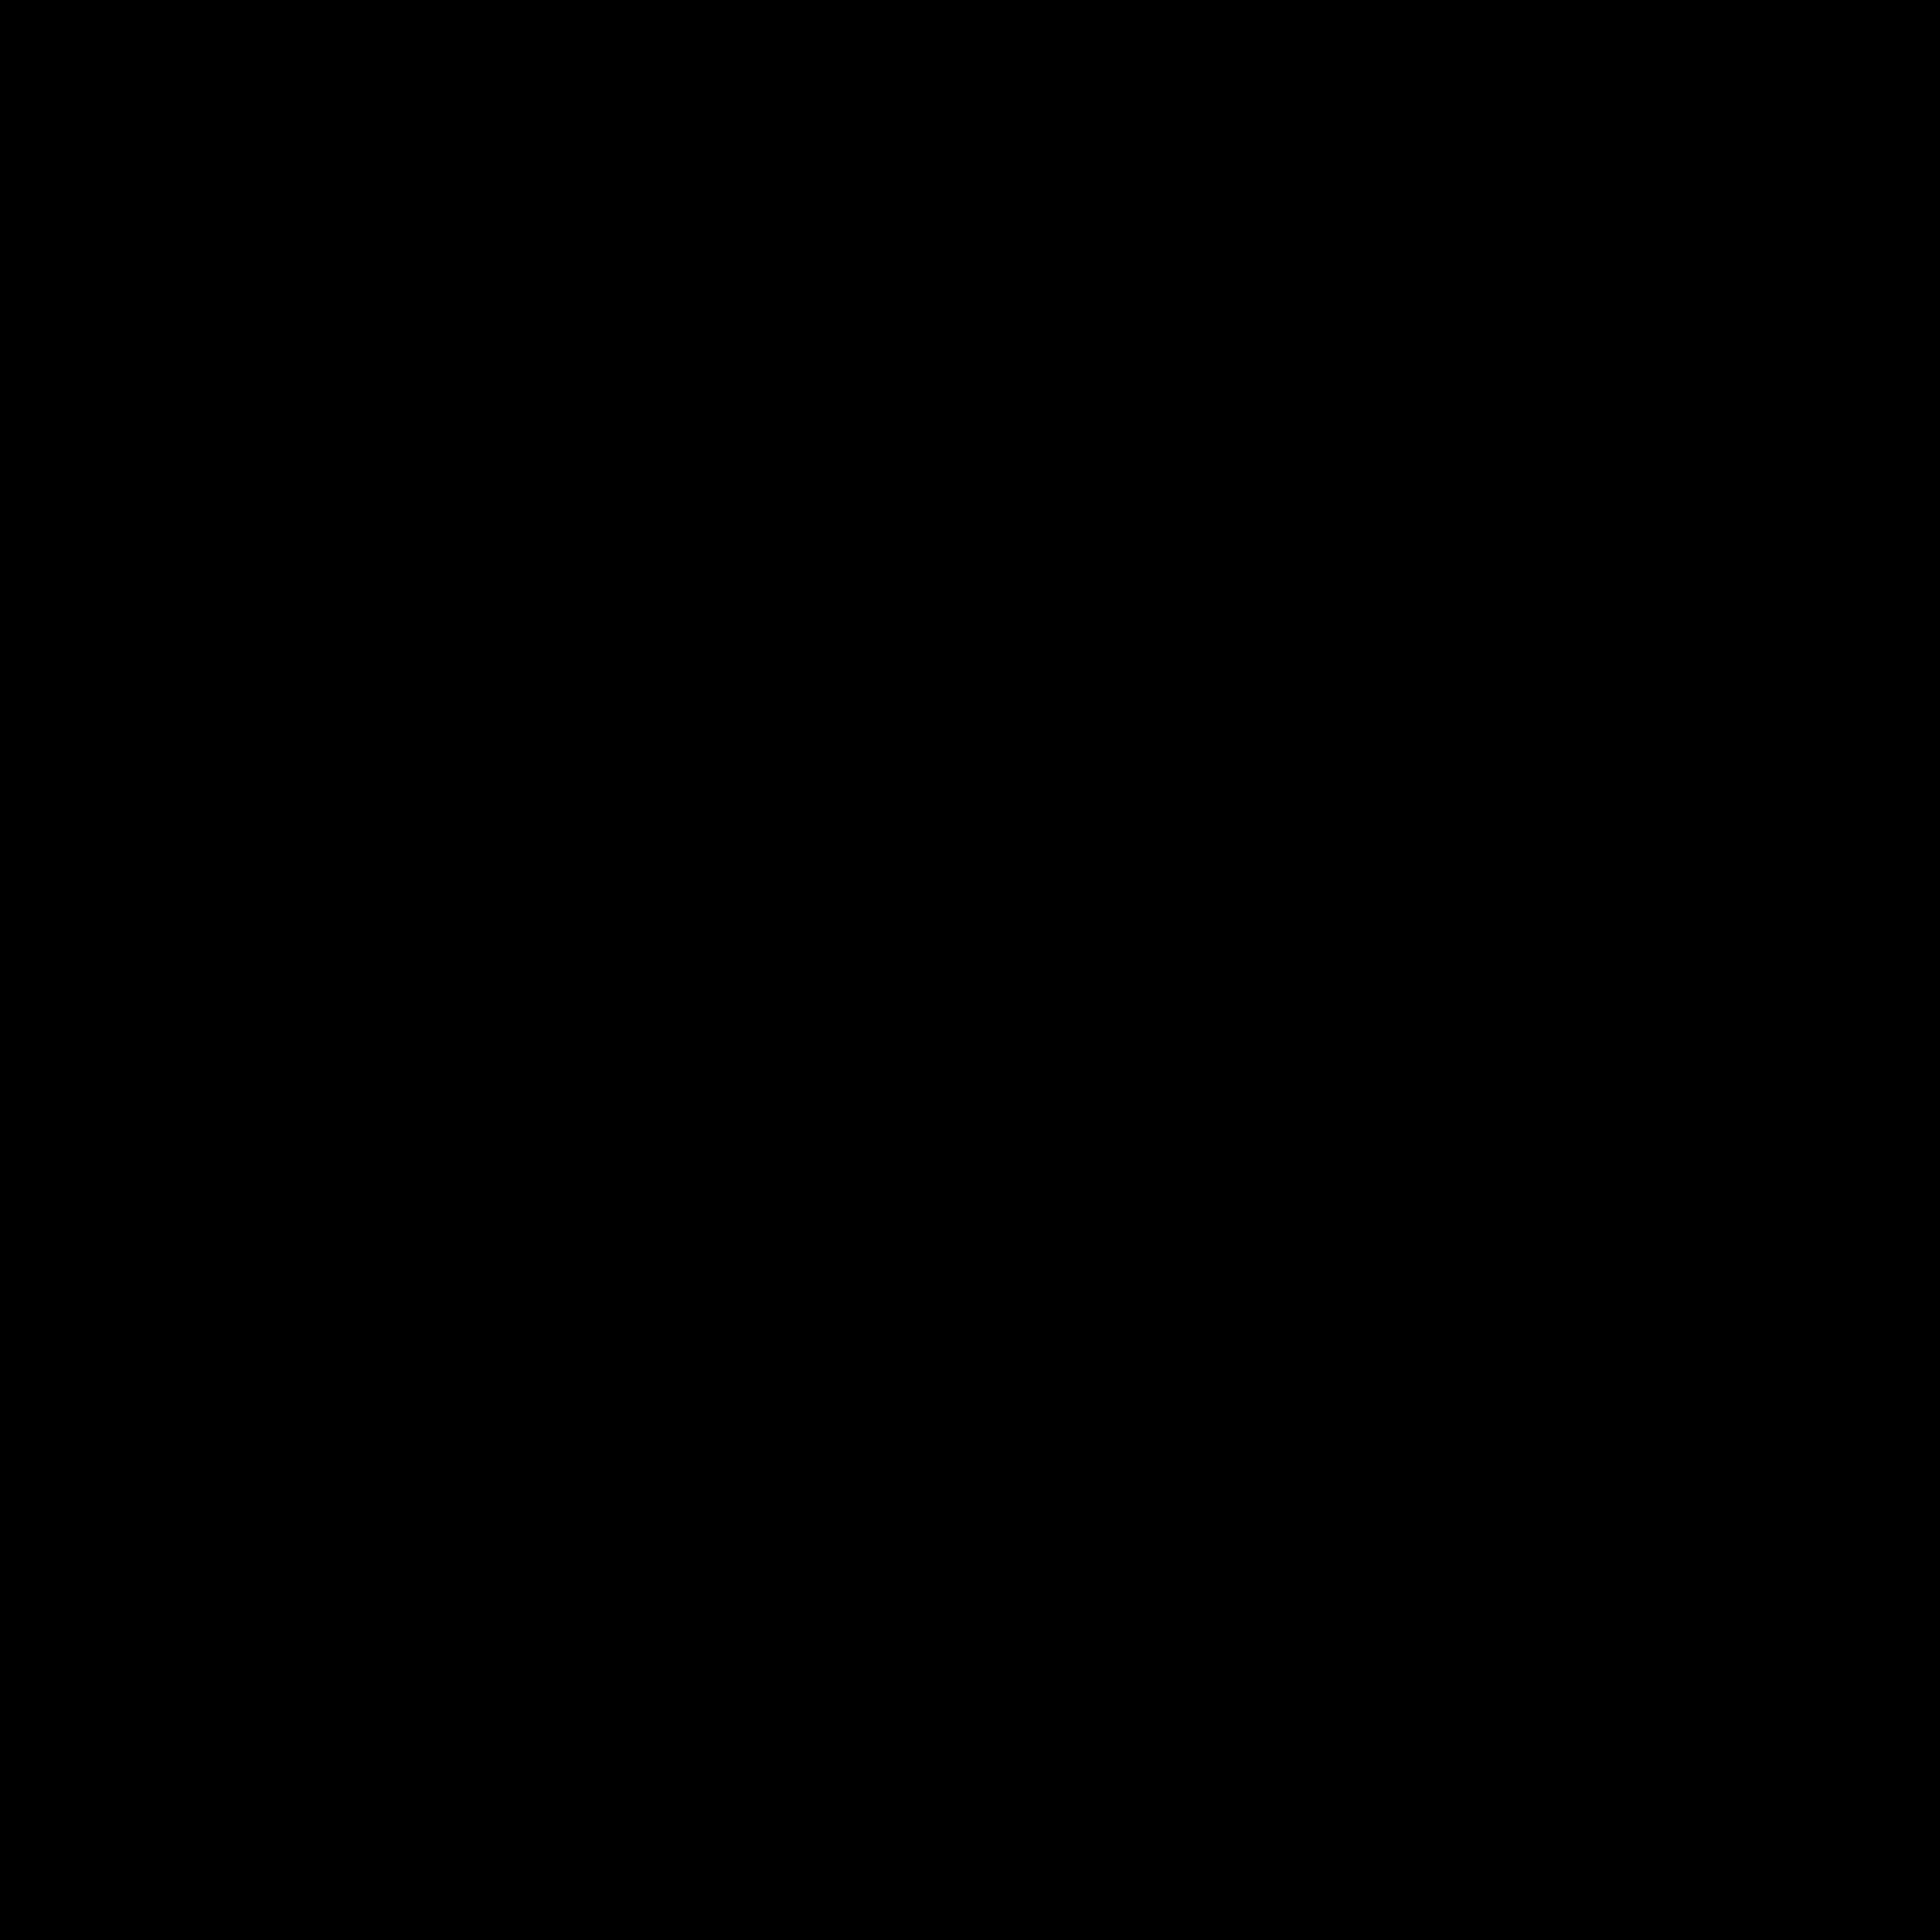 Akiuq Corporation